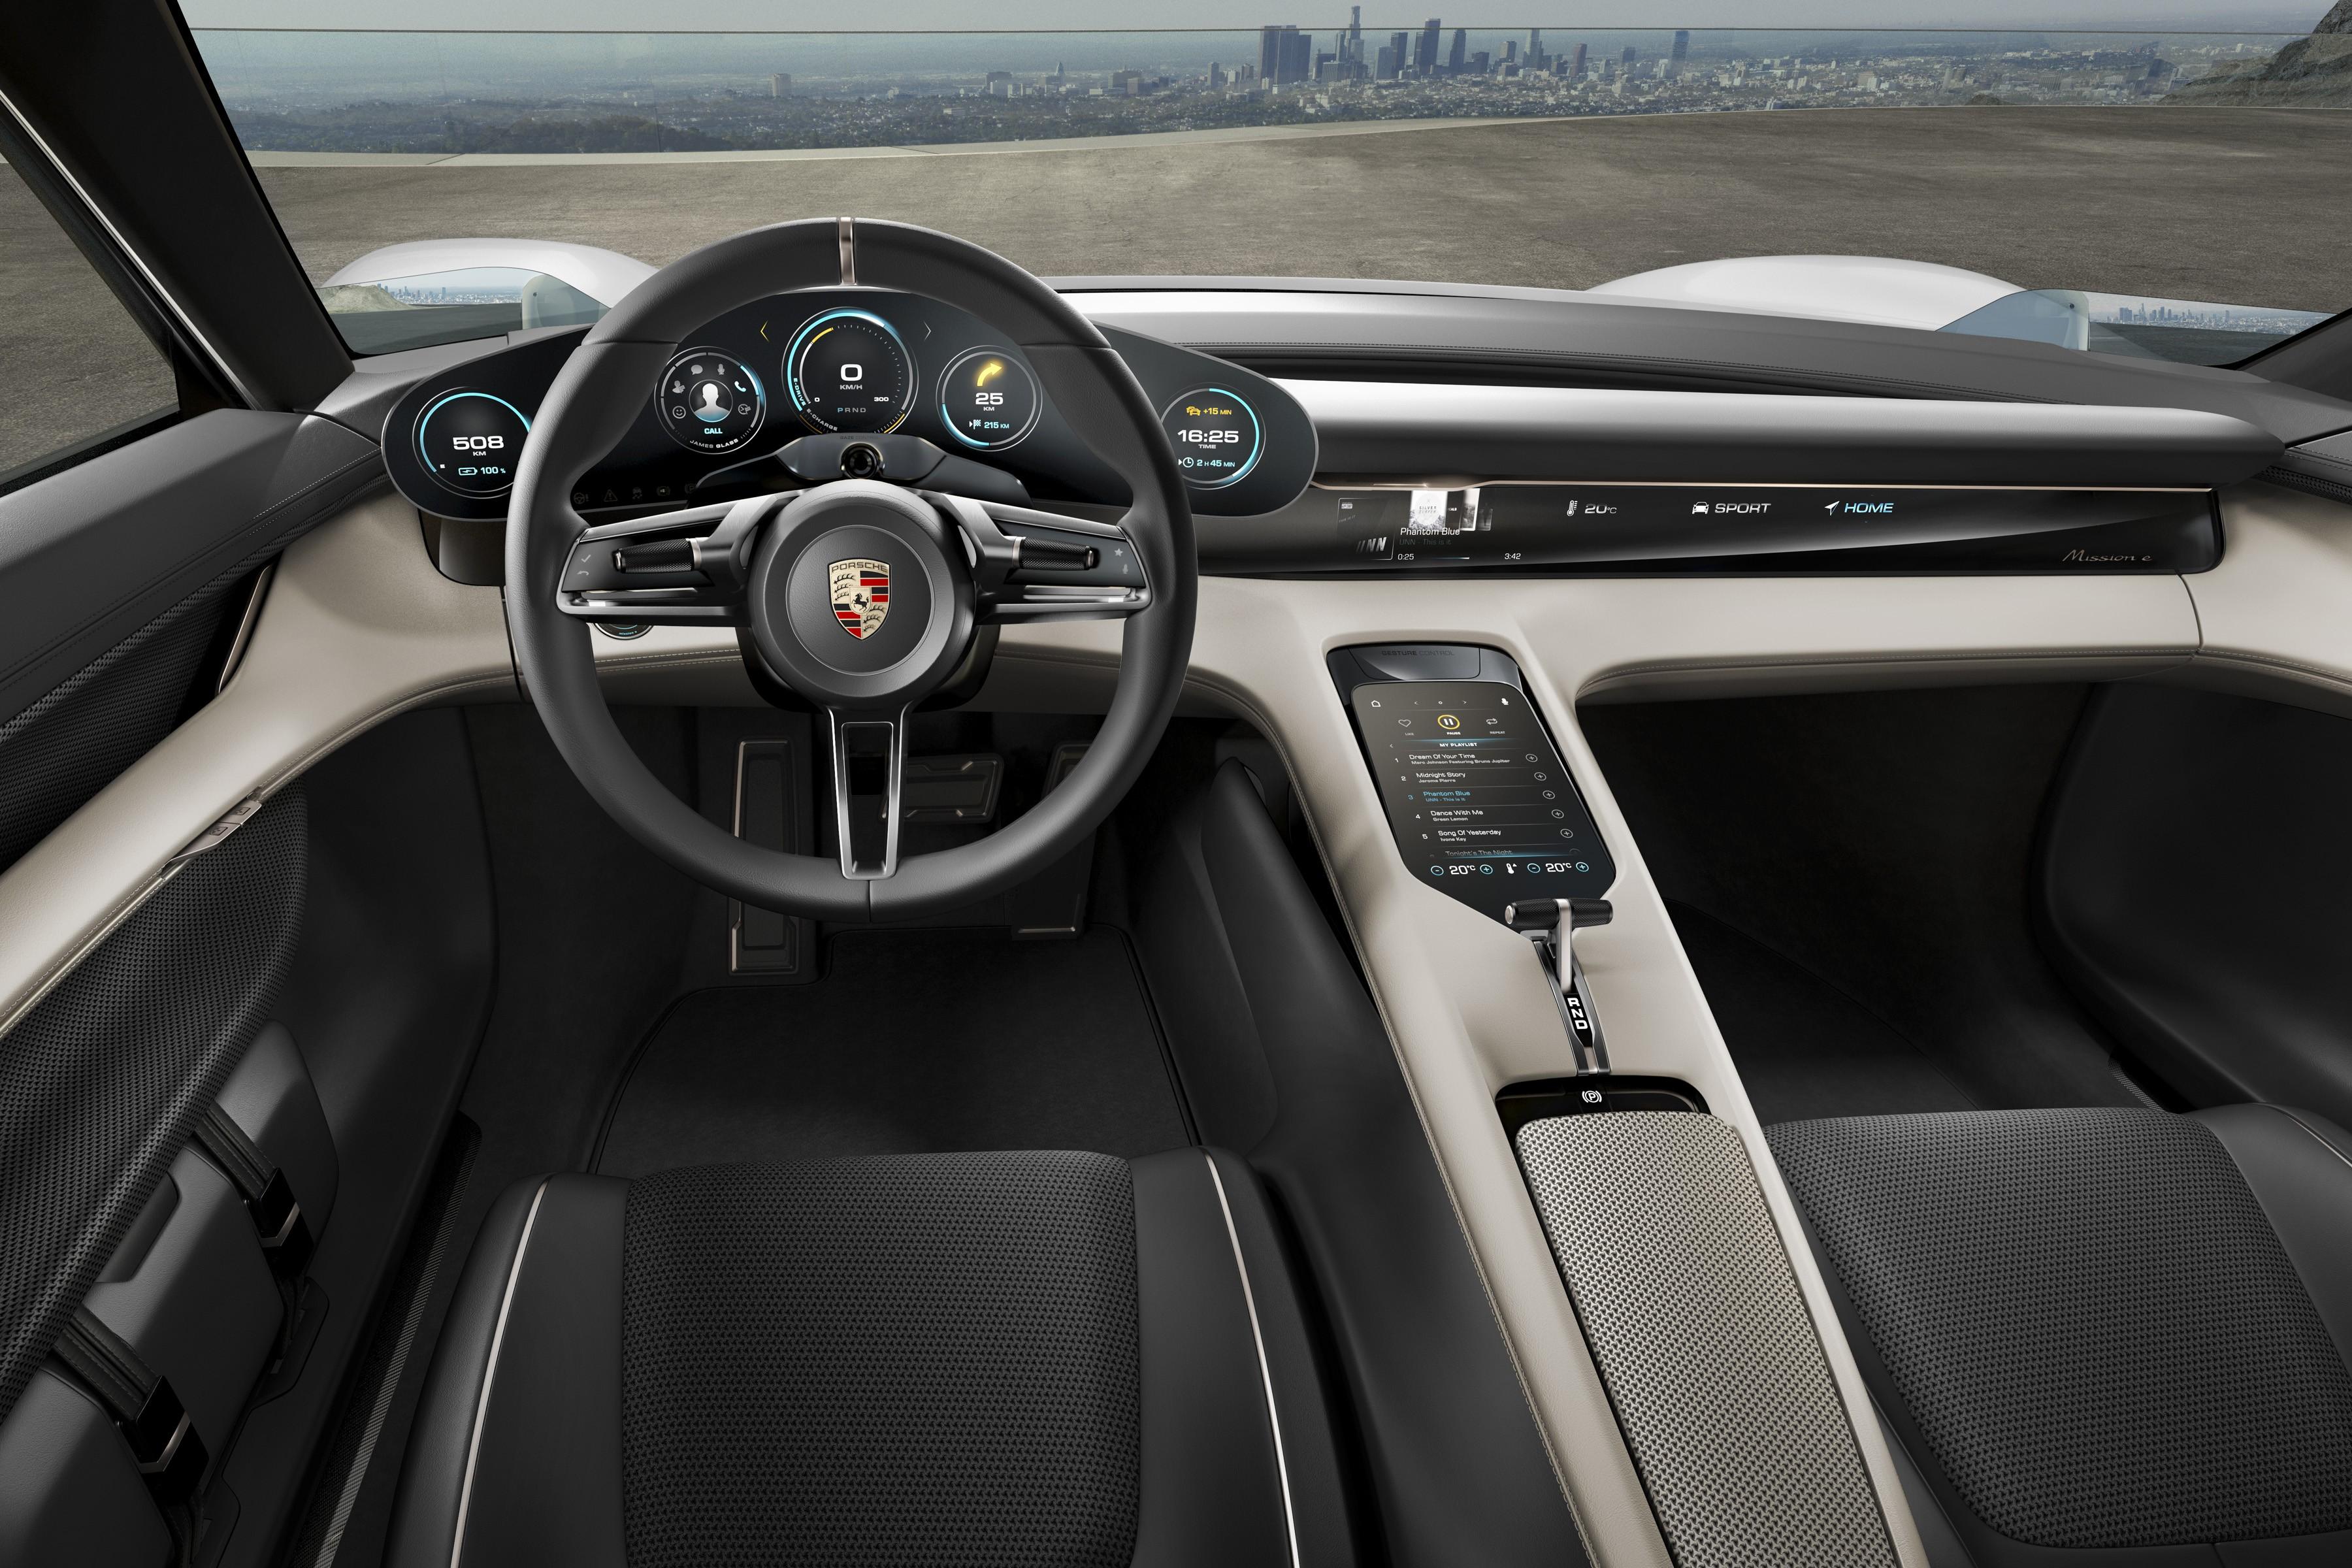 Wallpaper Porsche Mission E Electric Cars Supercar